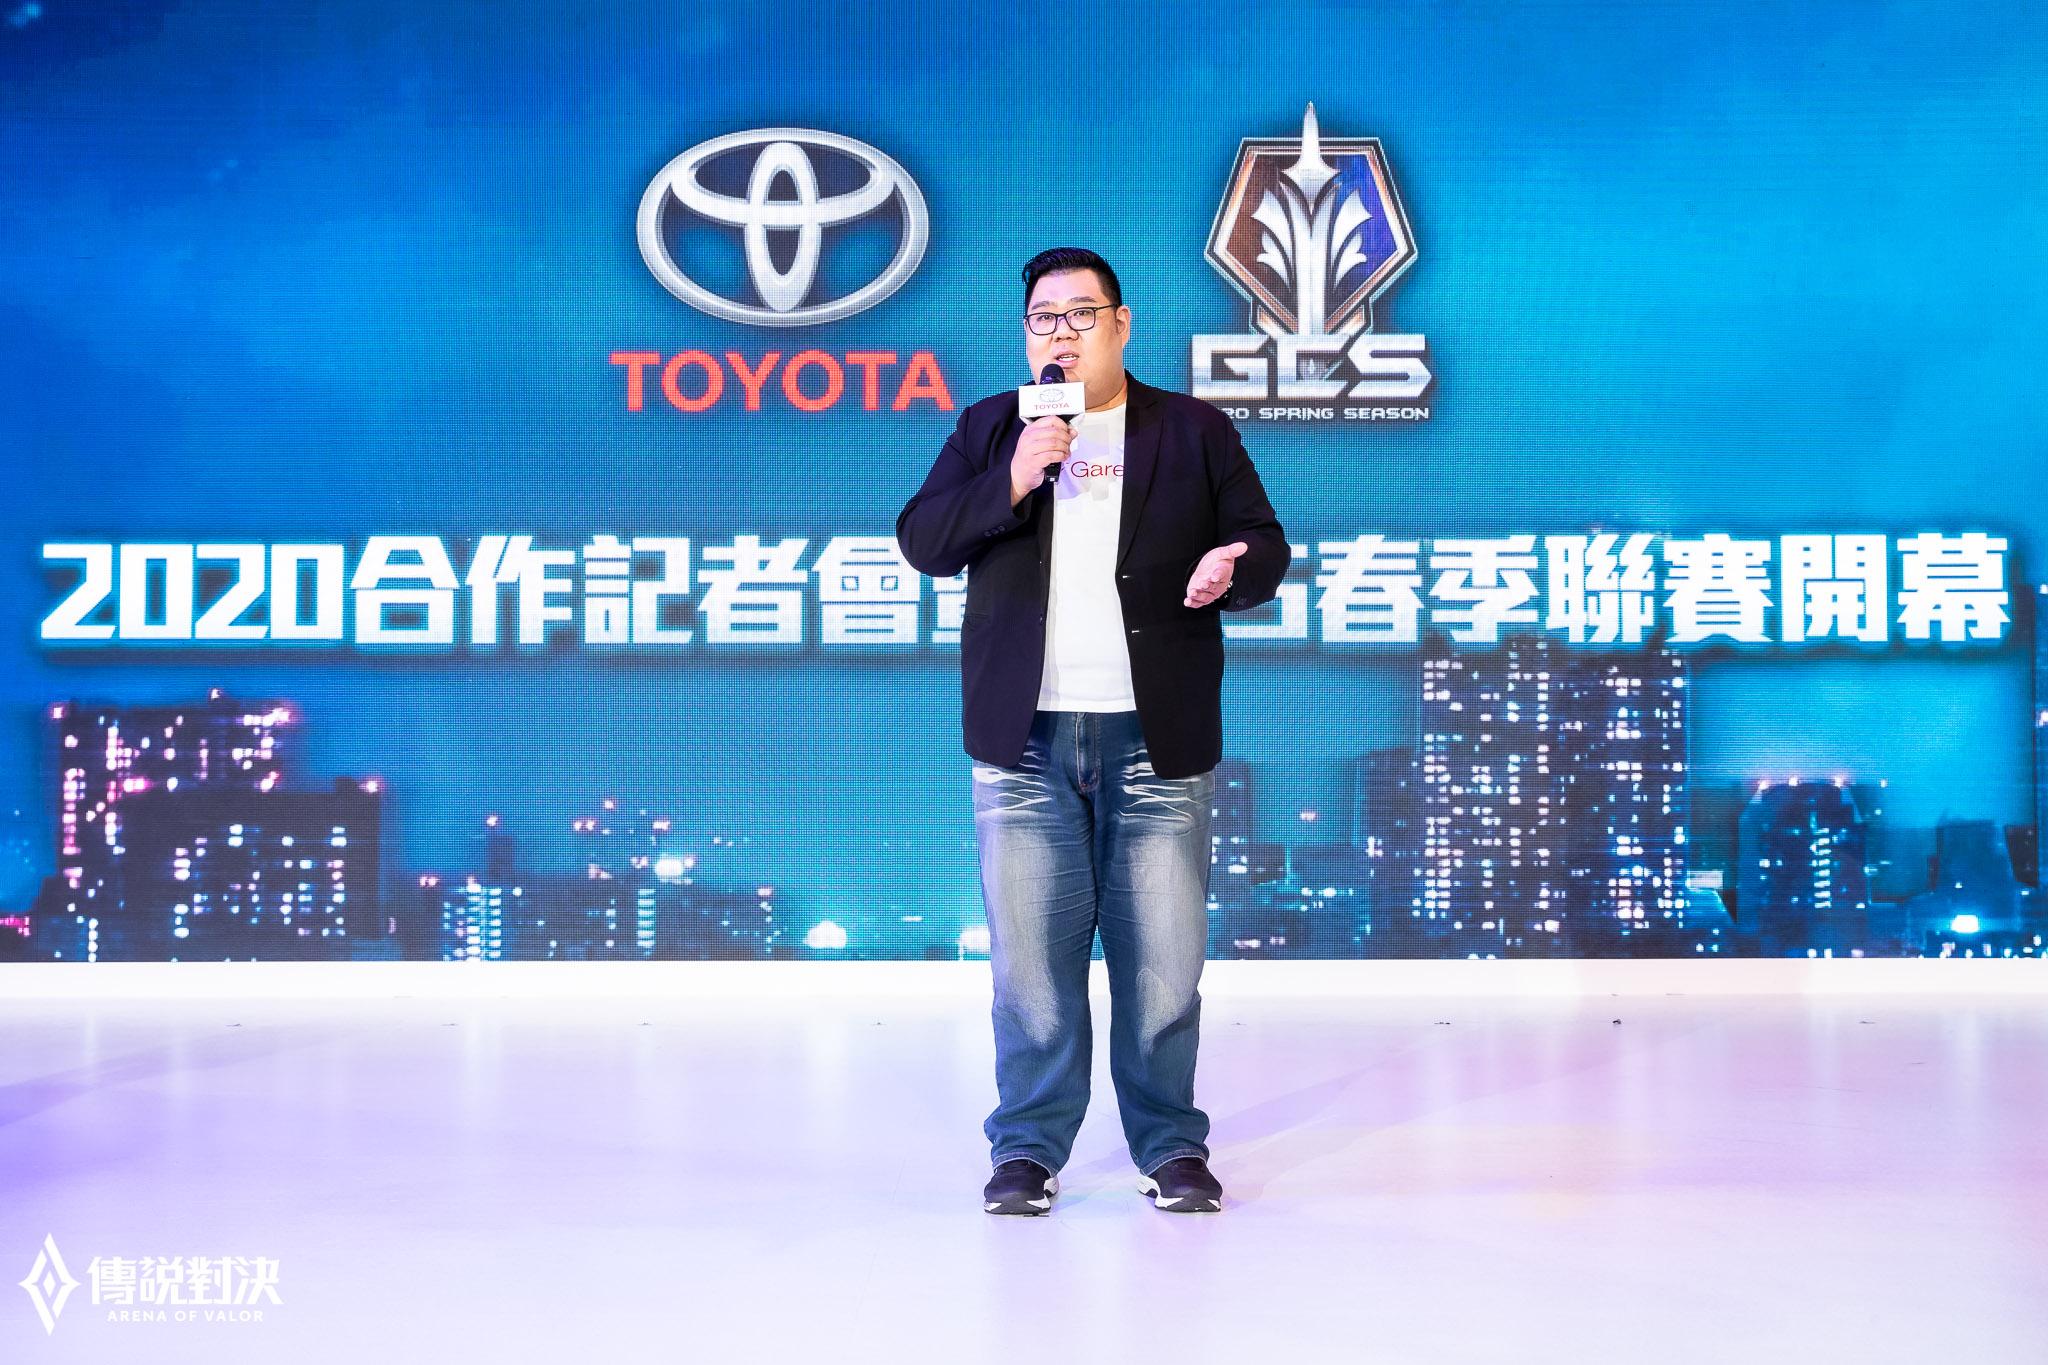 ▲Garena協理陳先倫 宣布持續與TOYOTA跨界合作,帶給喜愛《Garena傳說對決》與汽車迷更多元豐富的遊戲及生活體驗